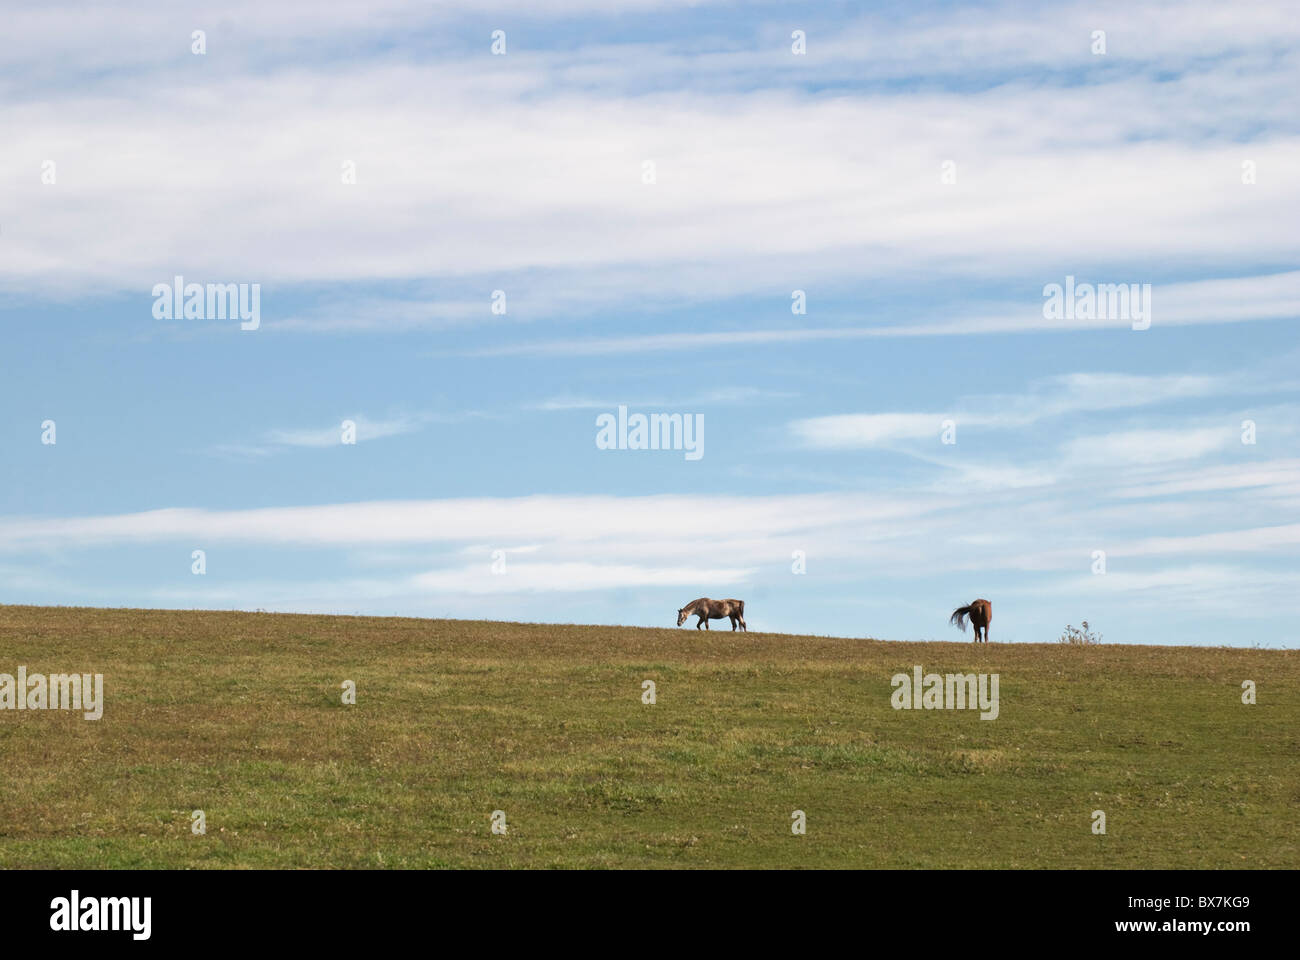 Horses grazing on the horizon under big open blue sky, fair weather landscape in Pennsylvania, USA. - Stock Image